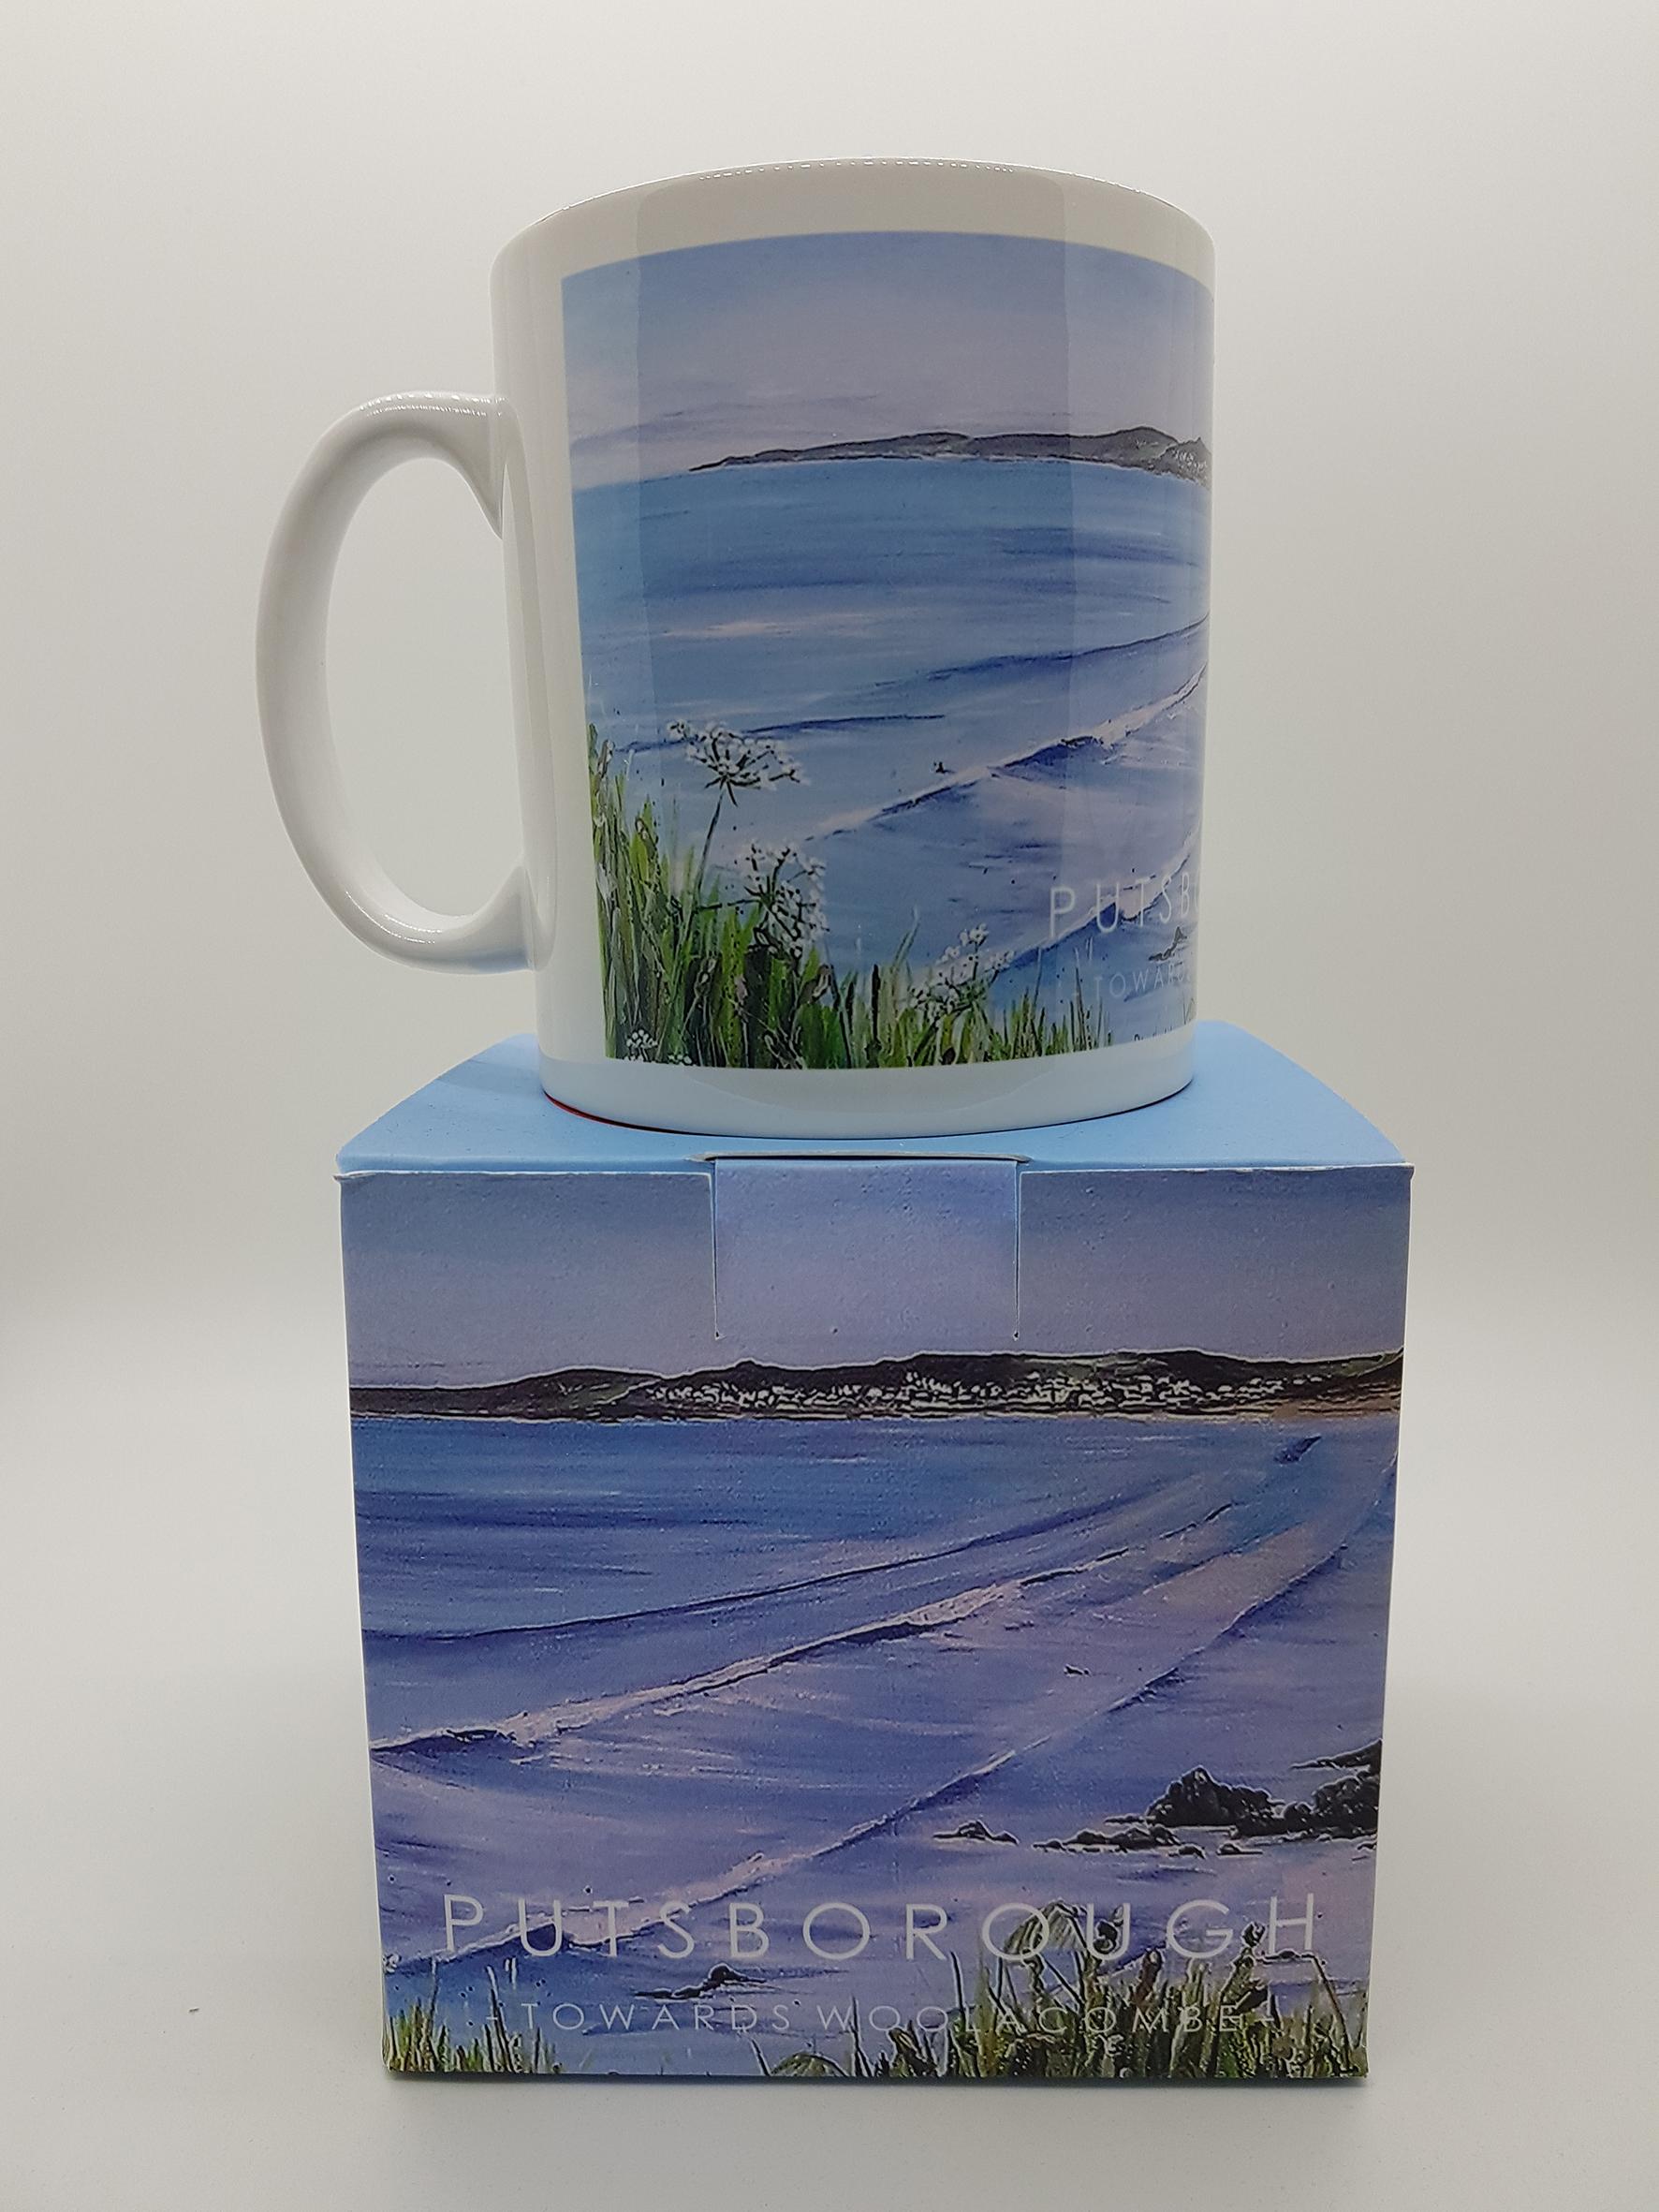 Mug featuring Putsborough beach